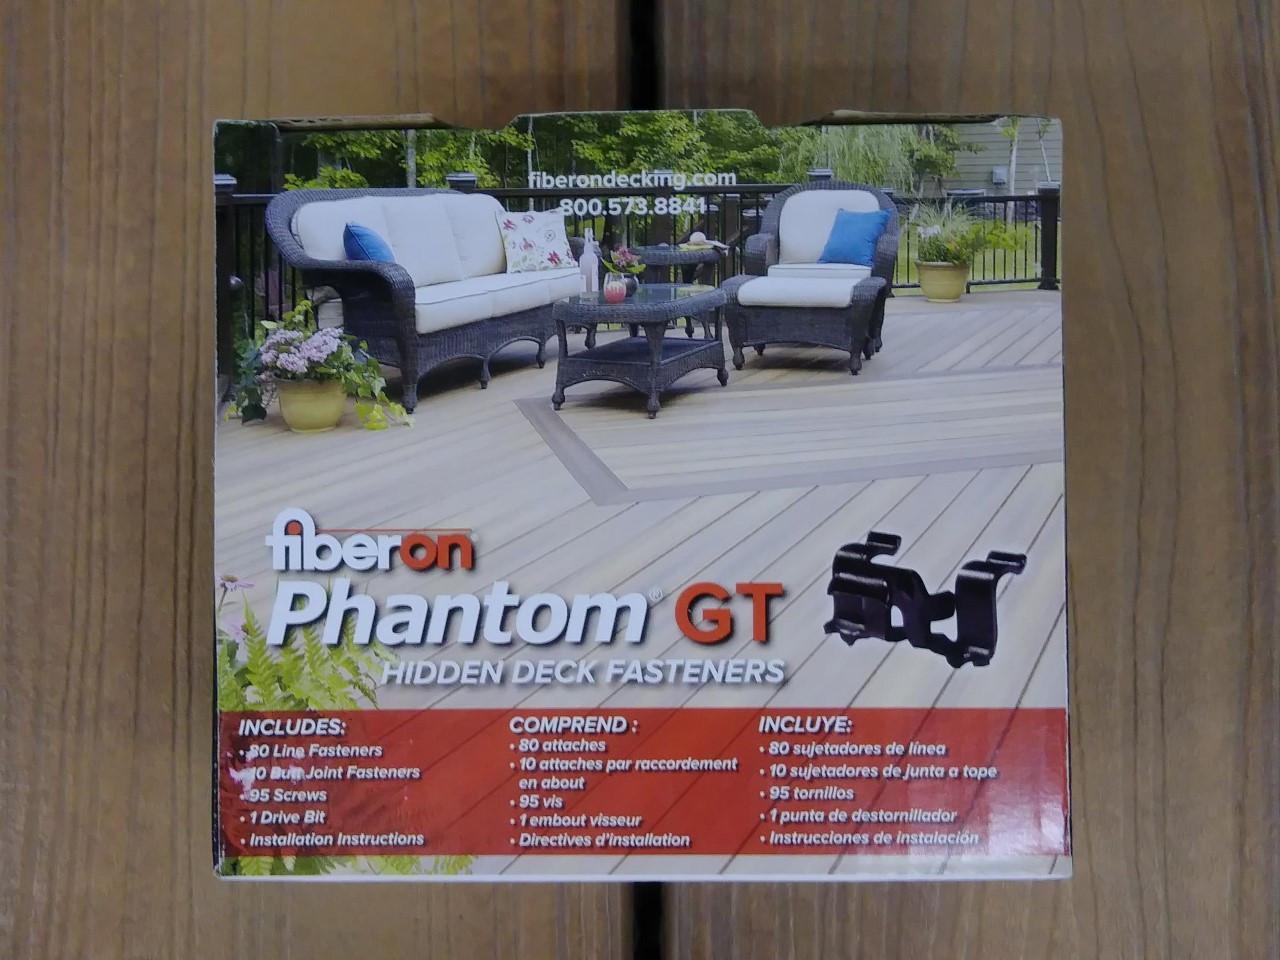 Fiberon Phantom GT Hidden Fasteners